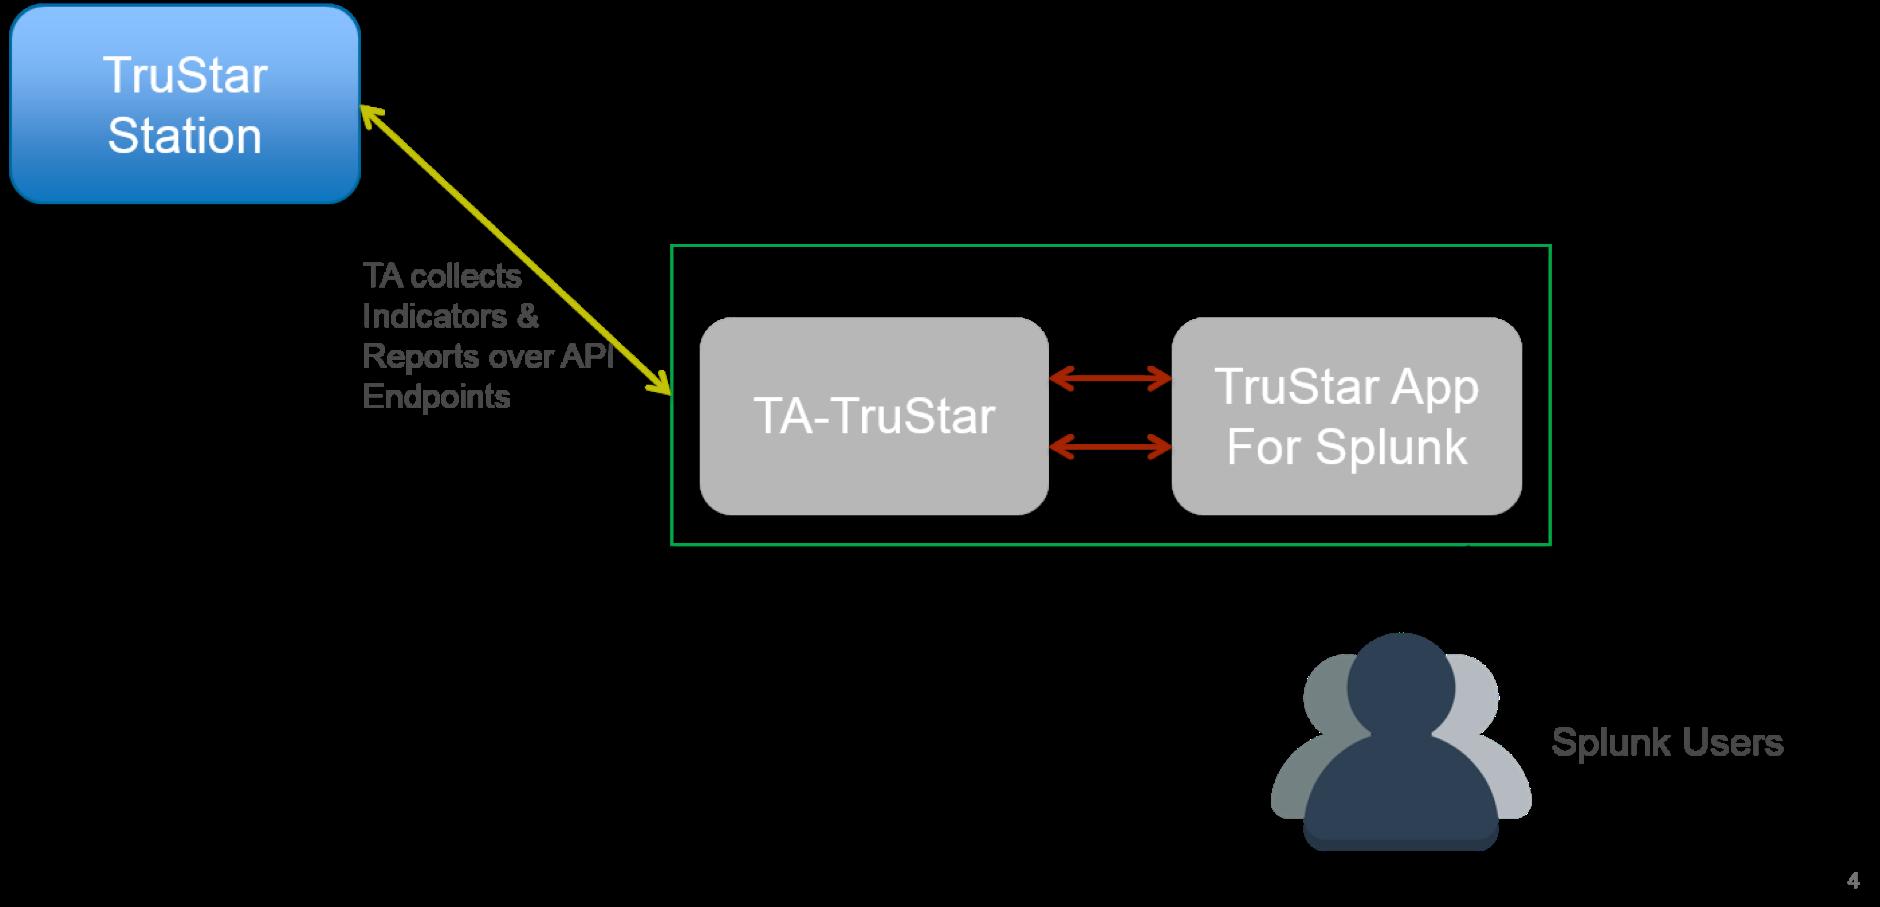 Splunk App 1 0 9 & Technology Add-On 1 0 9 - TruSTAR Knowledge Base